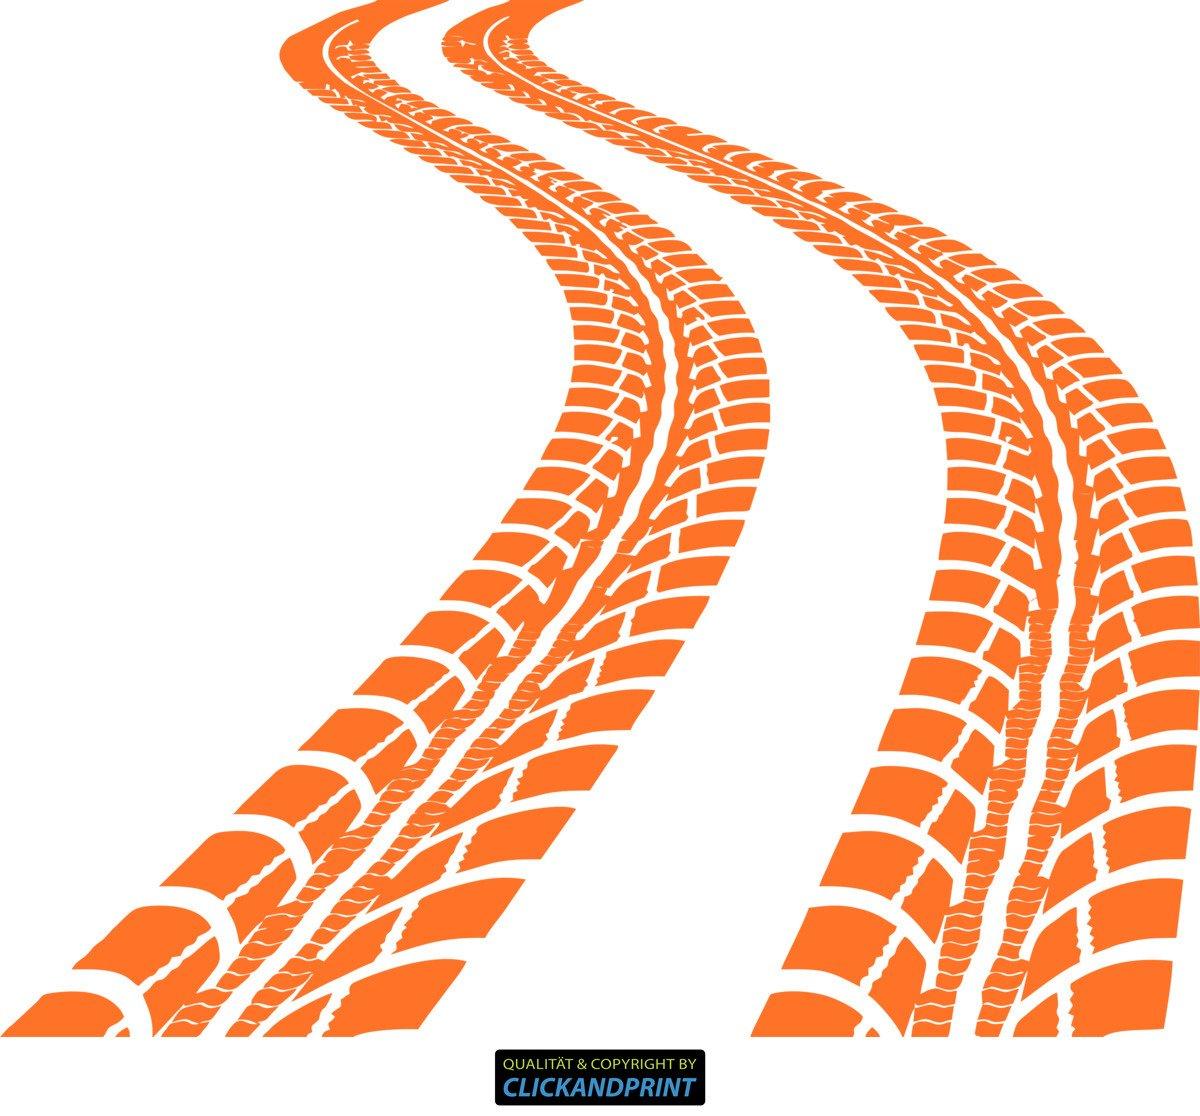 CLICKANDPRINT Aufkleber » Reifen-Spuren, 120x103,7cm, Schwarz • Wandtattoo   Wandaufkleber   Wandsticker   Wanddeko   Vinyl B01N5IYZZO Wandtattoos & Wandbilder